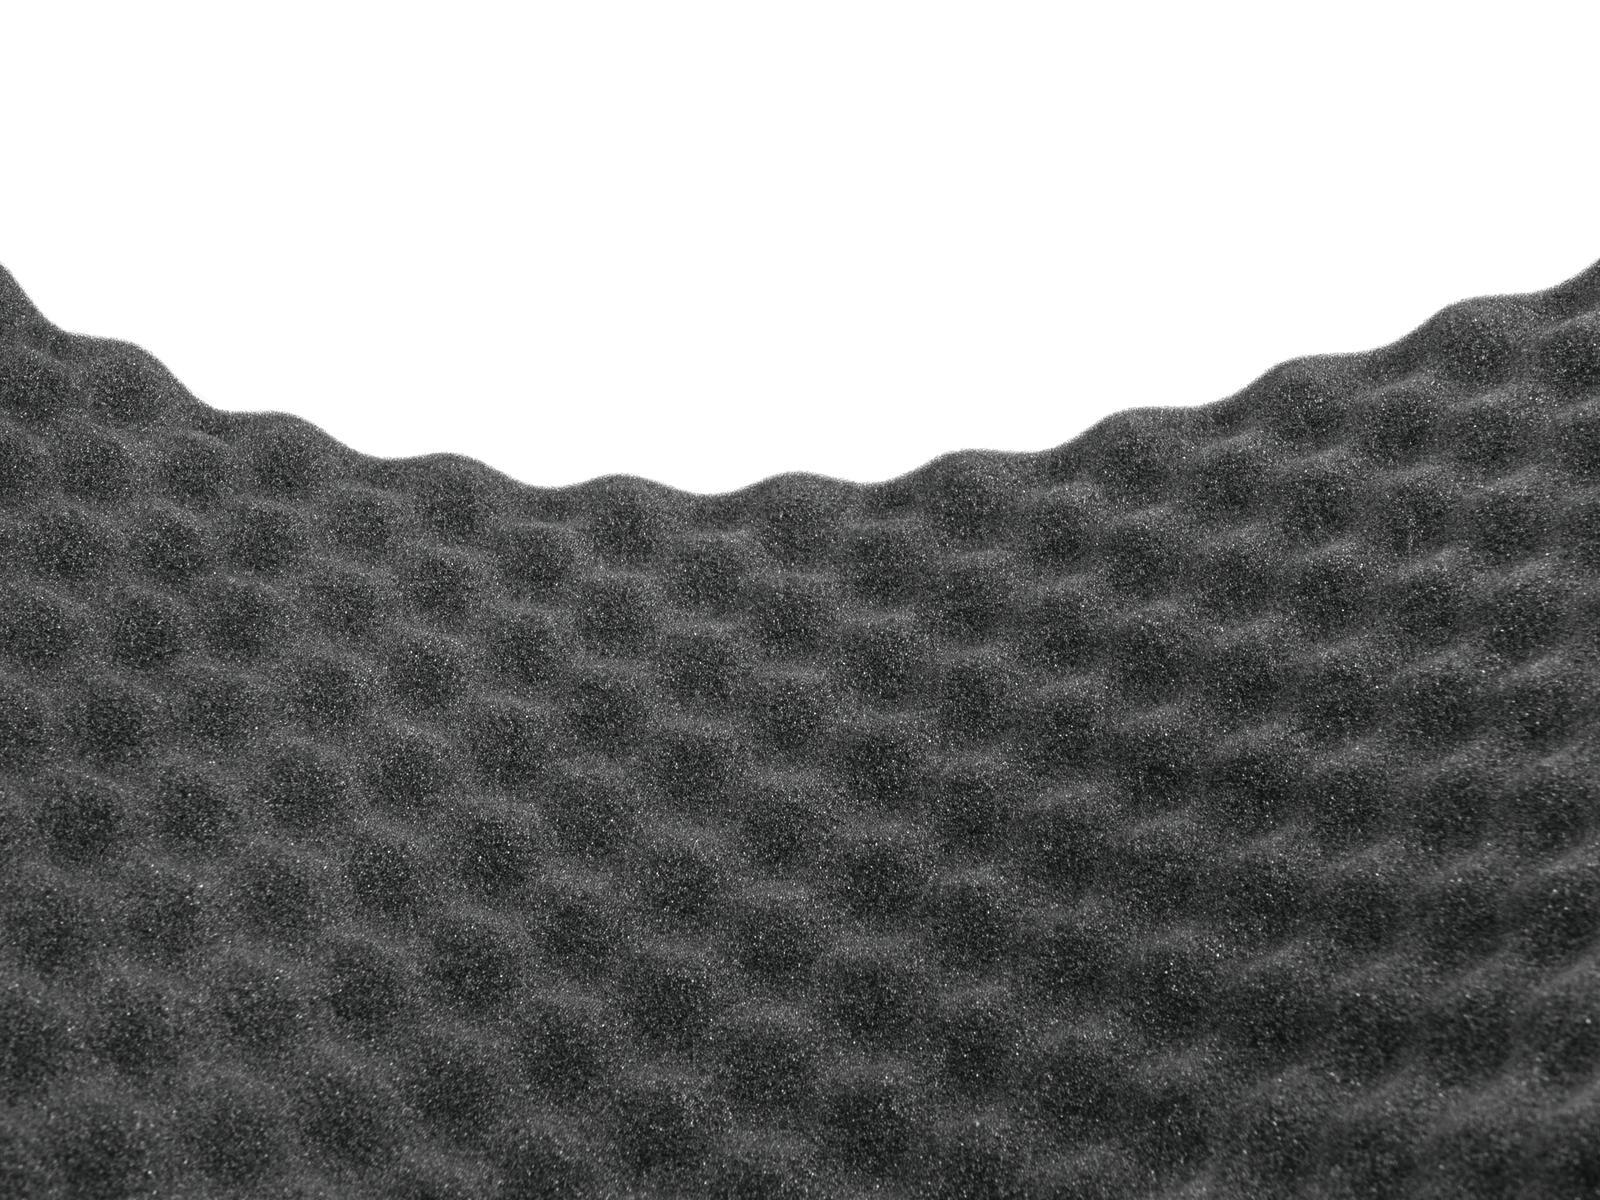 ACCESSORY Isoliermatte, Noppen Höhe 40mm, 100x206cm